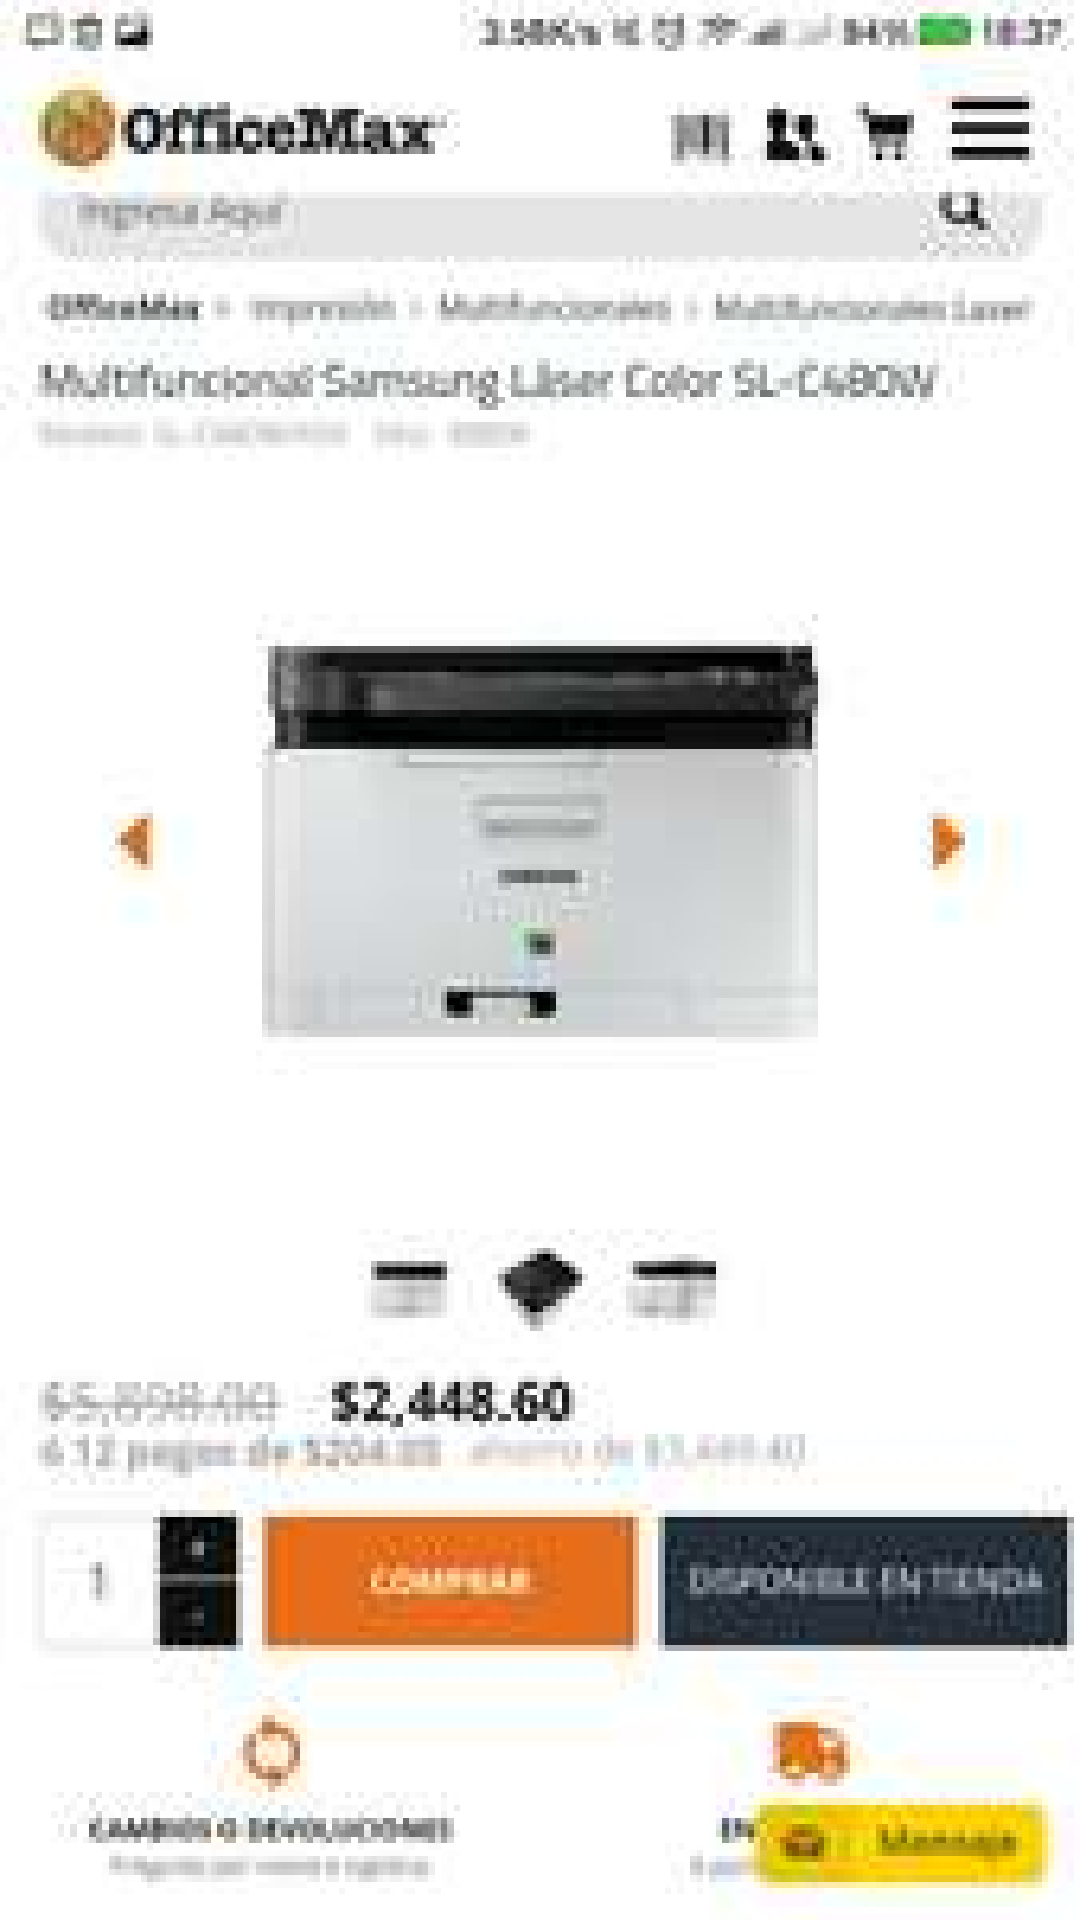 Office Max: Multifuncional Samsung Láser Color SL-C480W